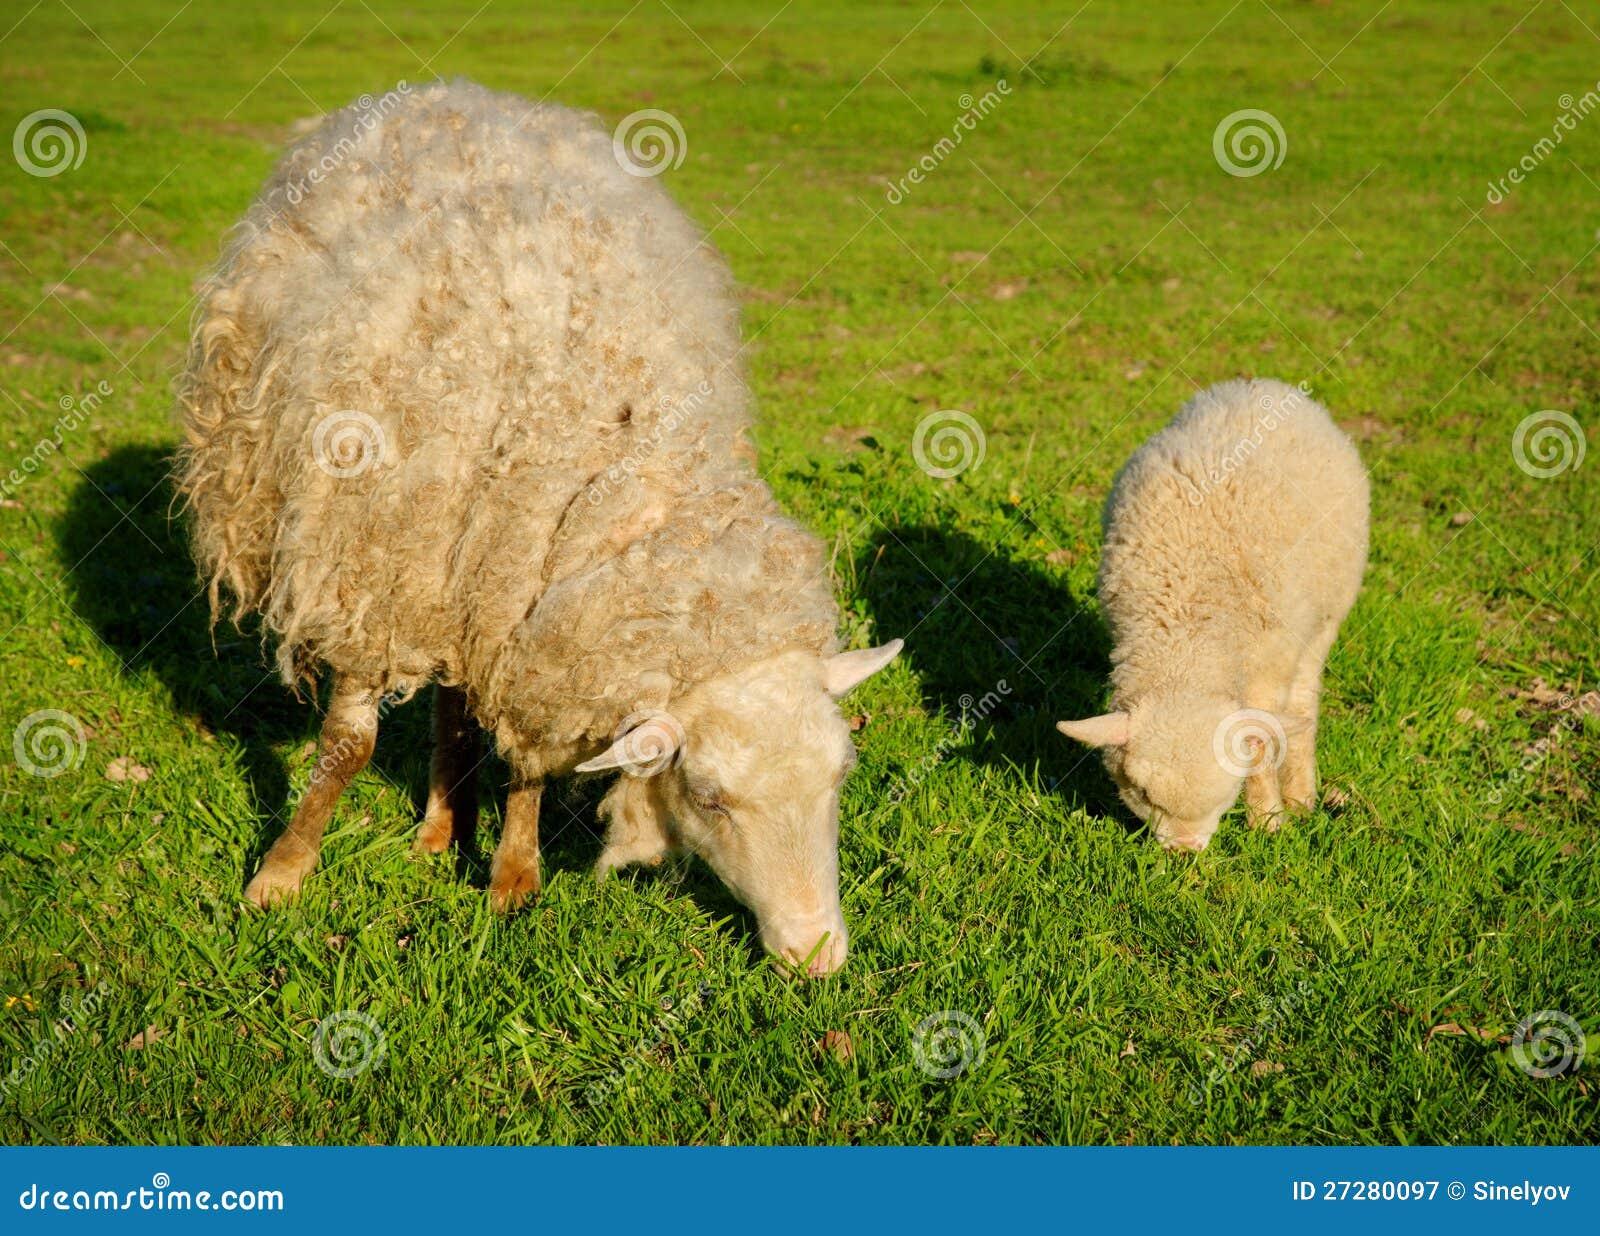 Sheep and lamp stock image. Image of grass, fleece, grassland ...